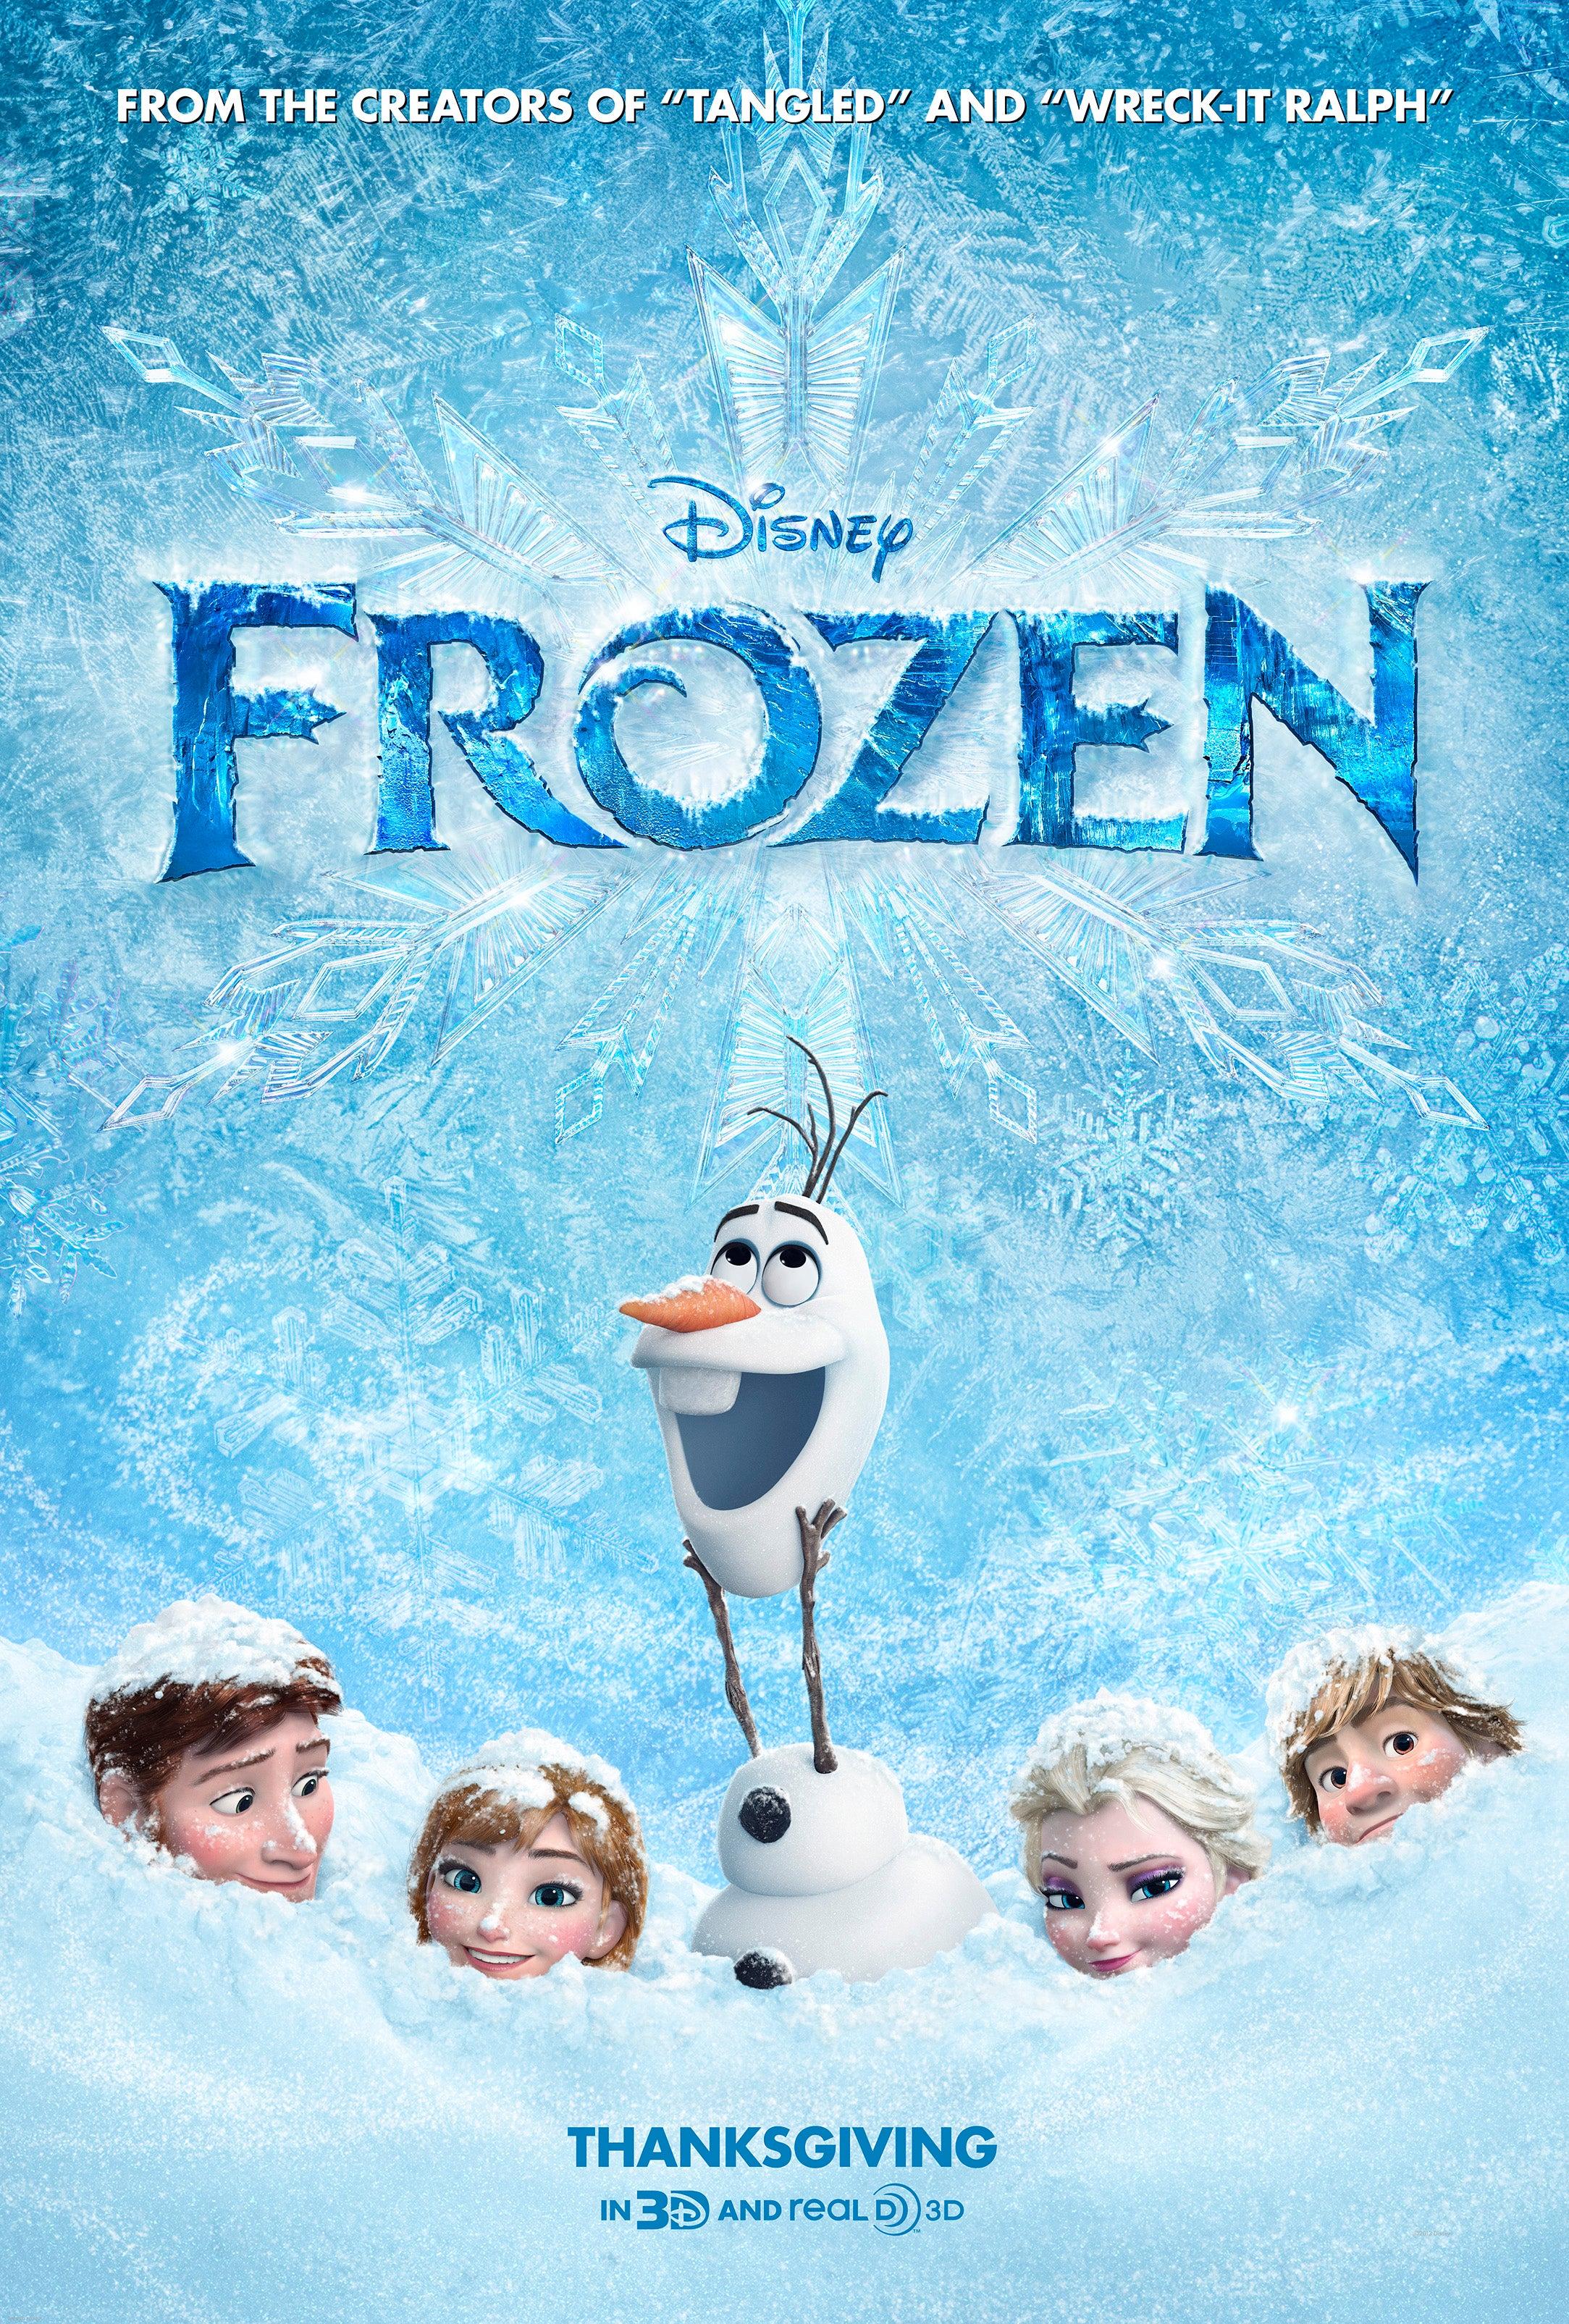 http://media.comicbook.com/wp-content/uploads/2013/09/Frozen-movie-poster.jpg